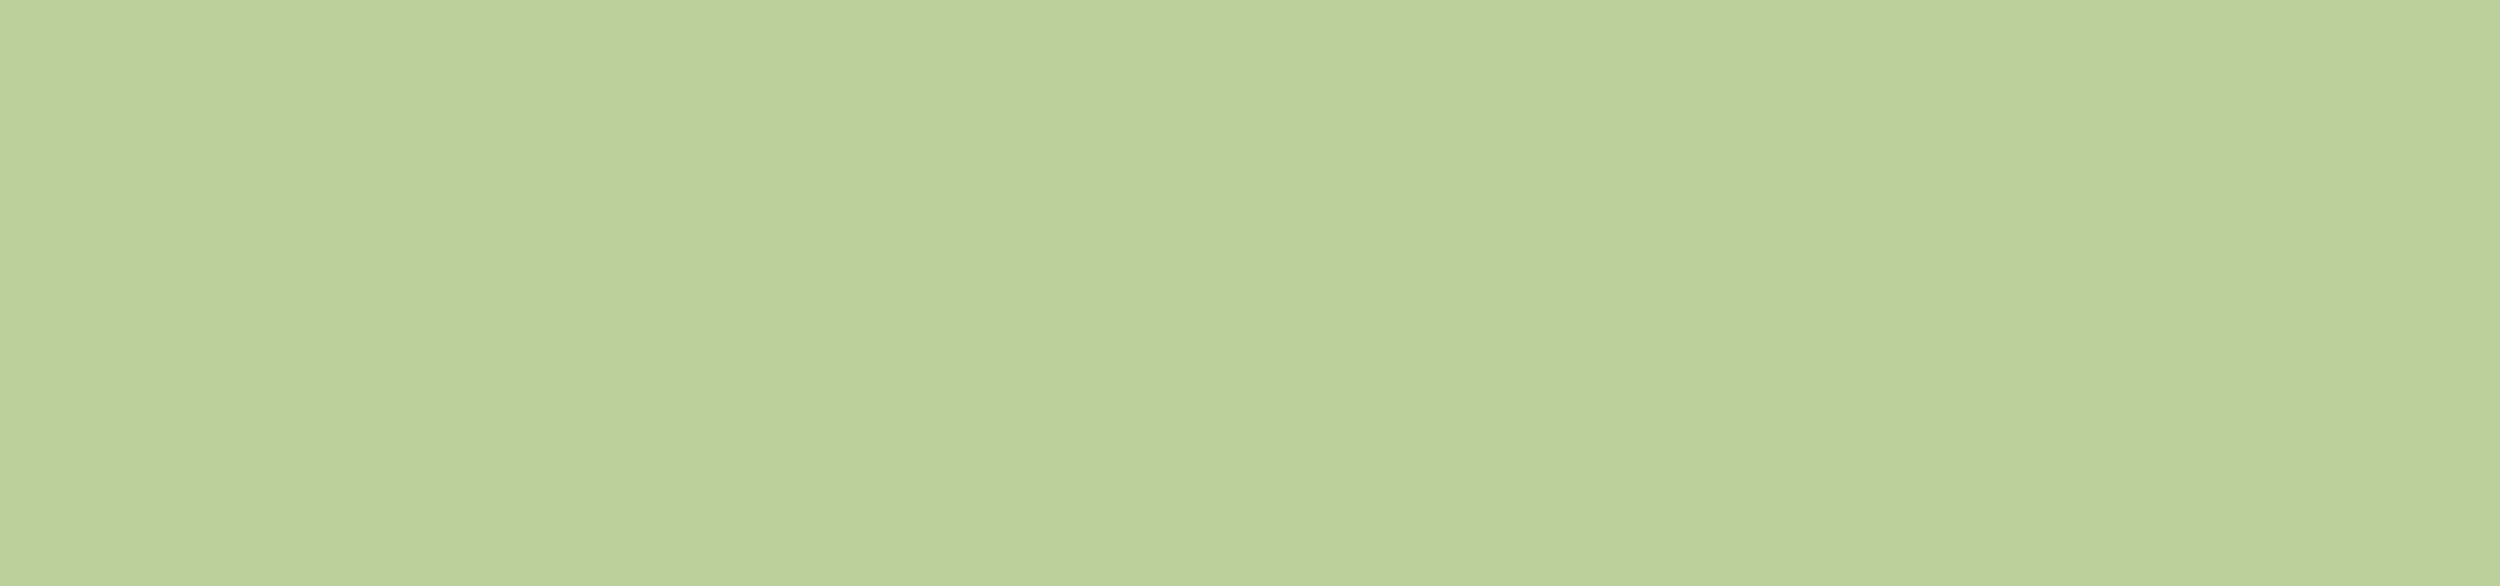 Bandeau vert.jpg